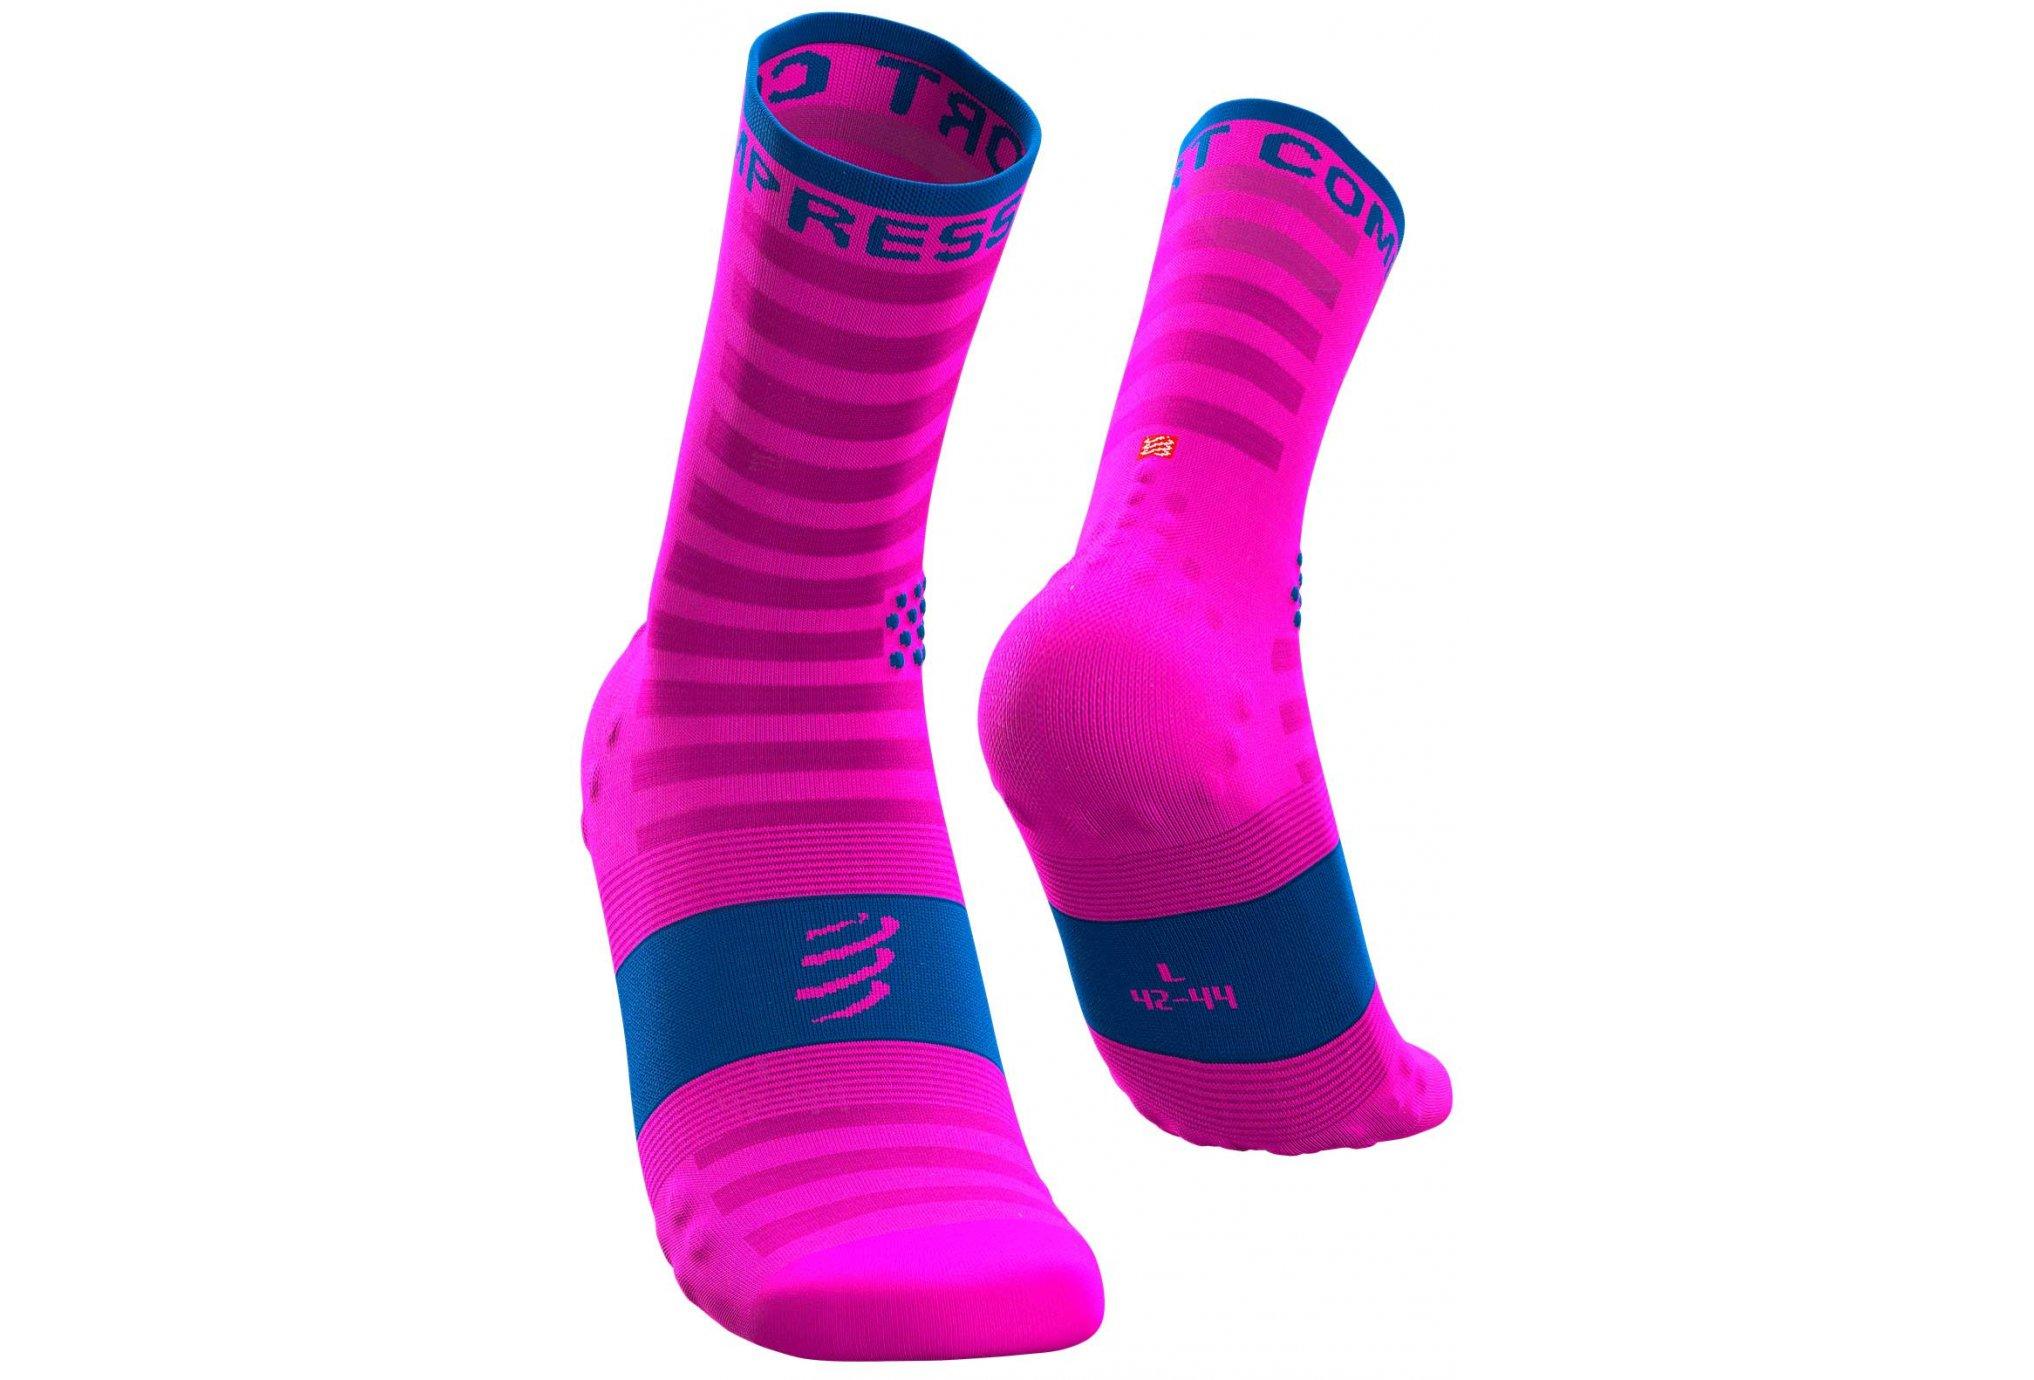 Compressport Pro Racing Socks V 3.0 Ultralight Run High Chaussettes